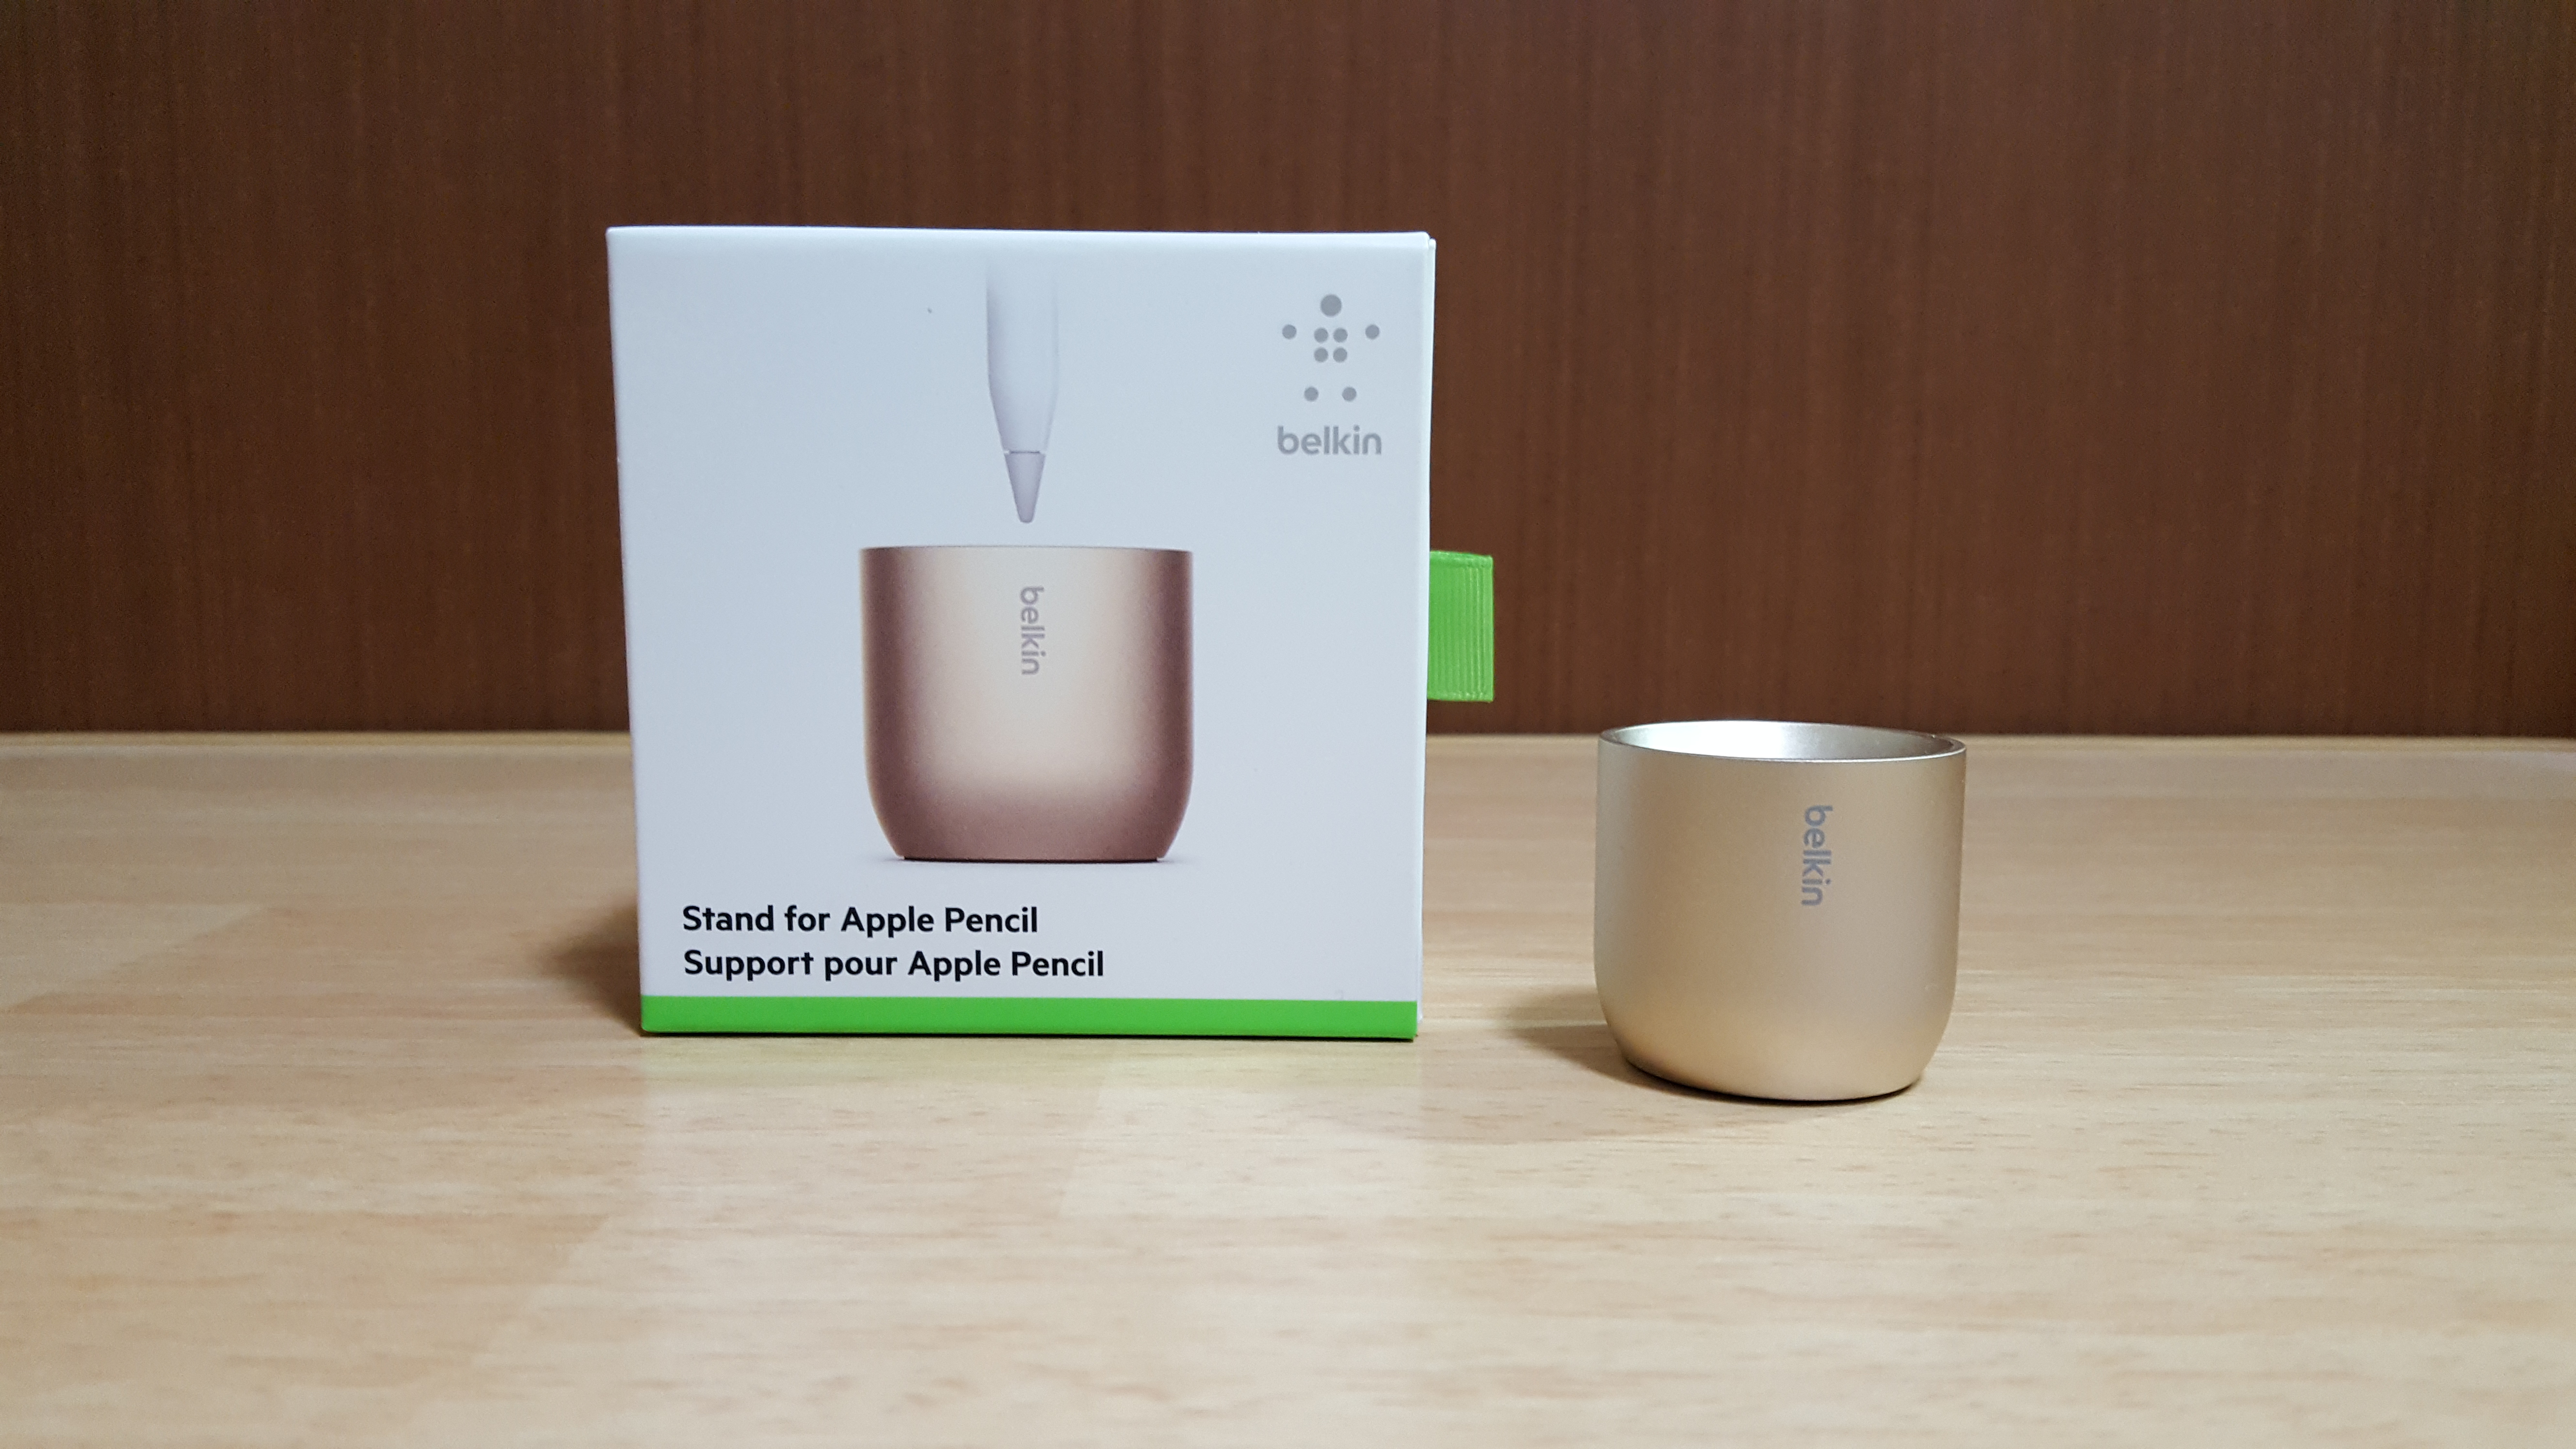 belkin「Stand for Apple Pencil」購入。その名のとおり、Apple Pencilを差すだけのスタンド。